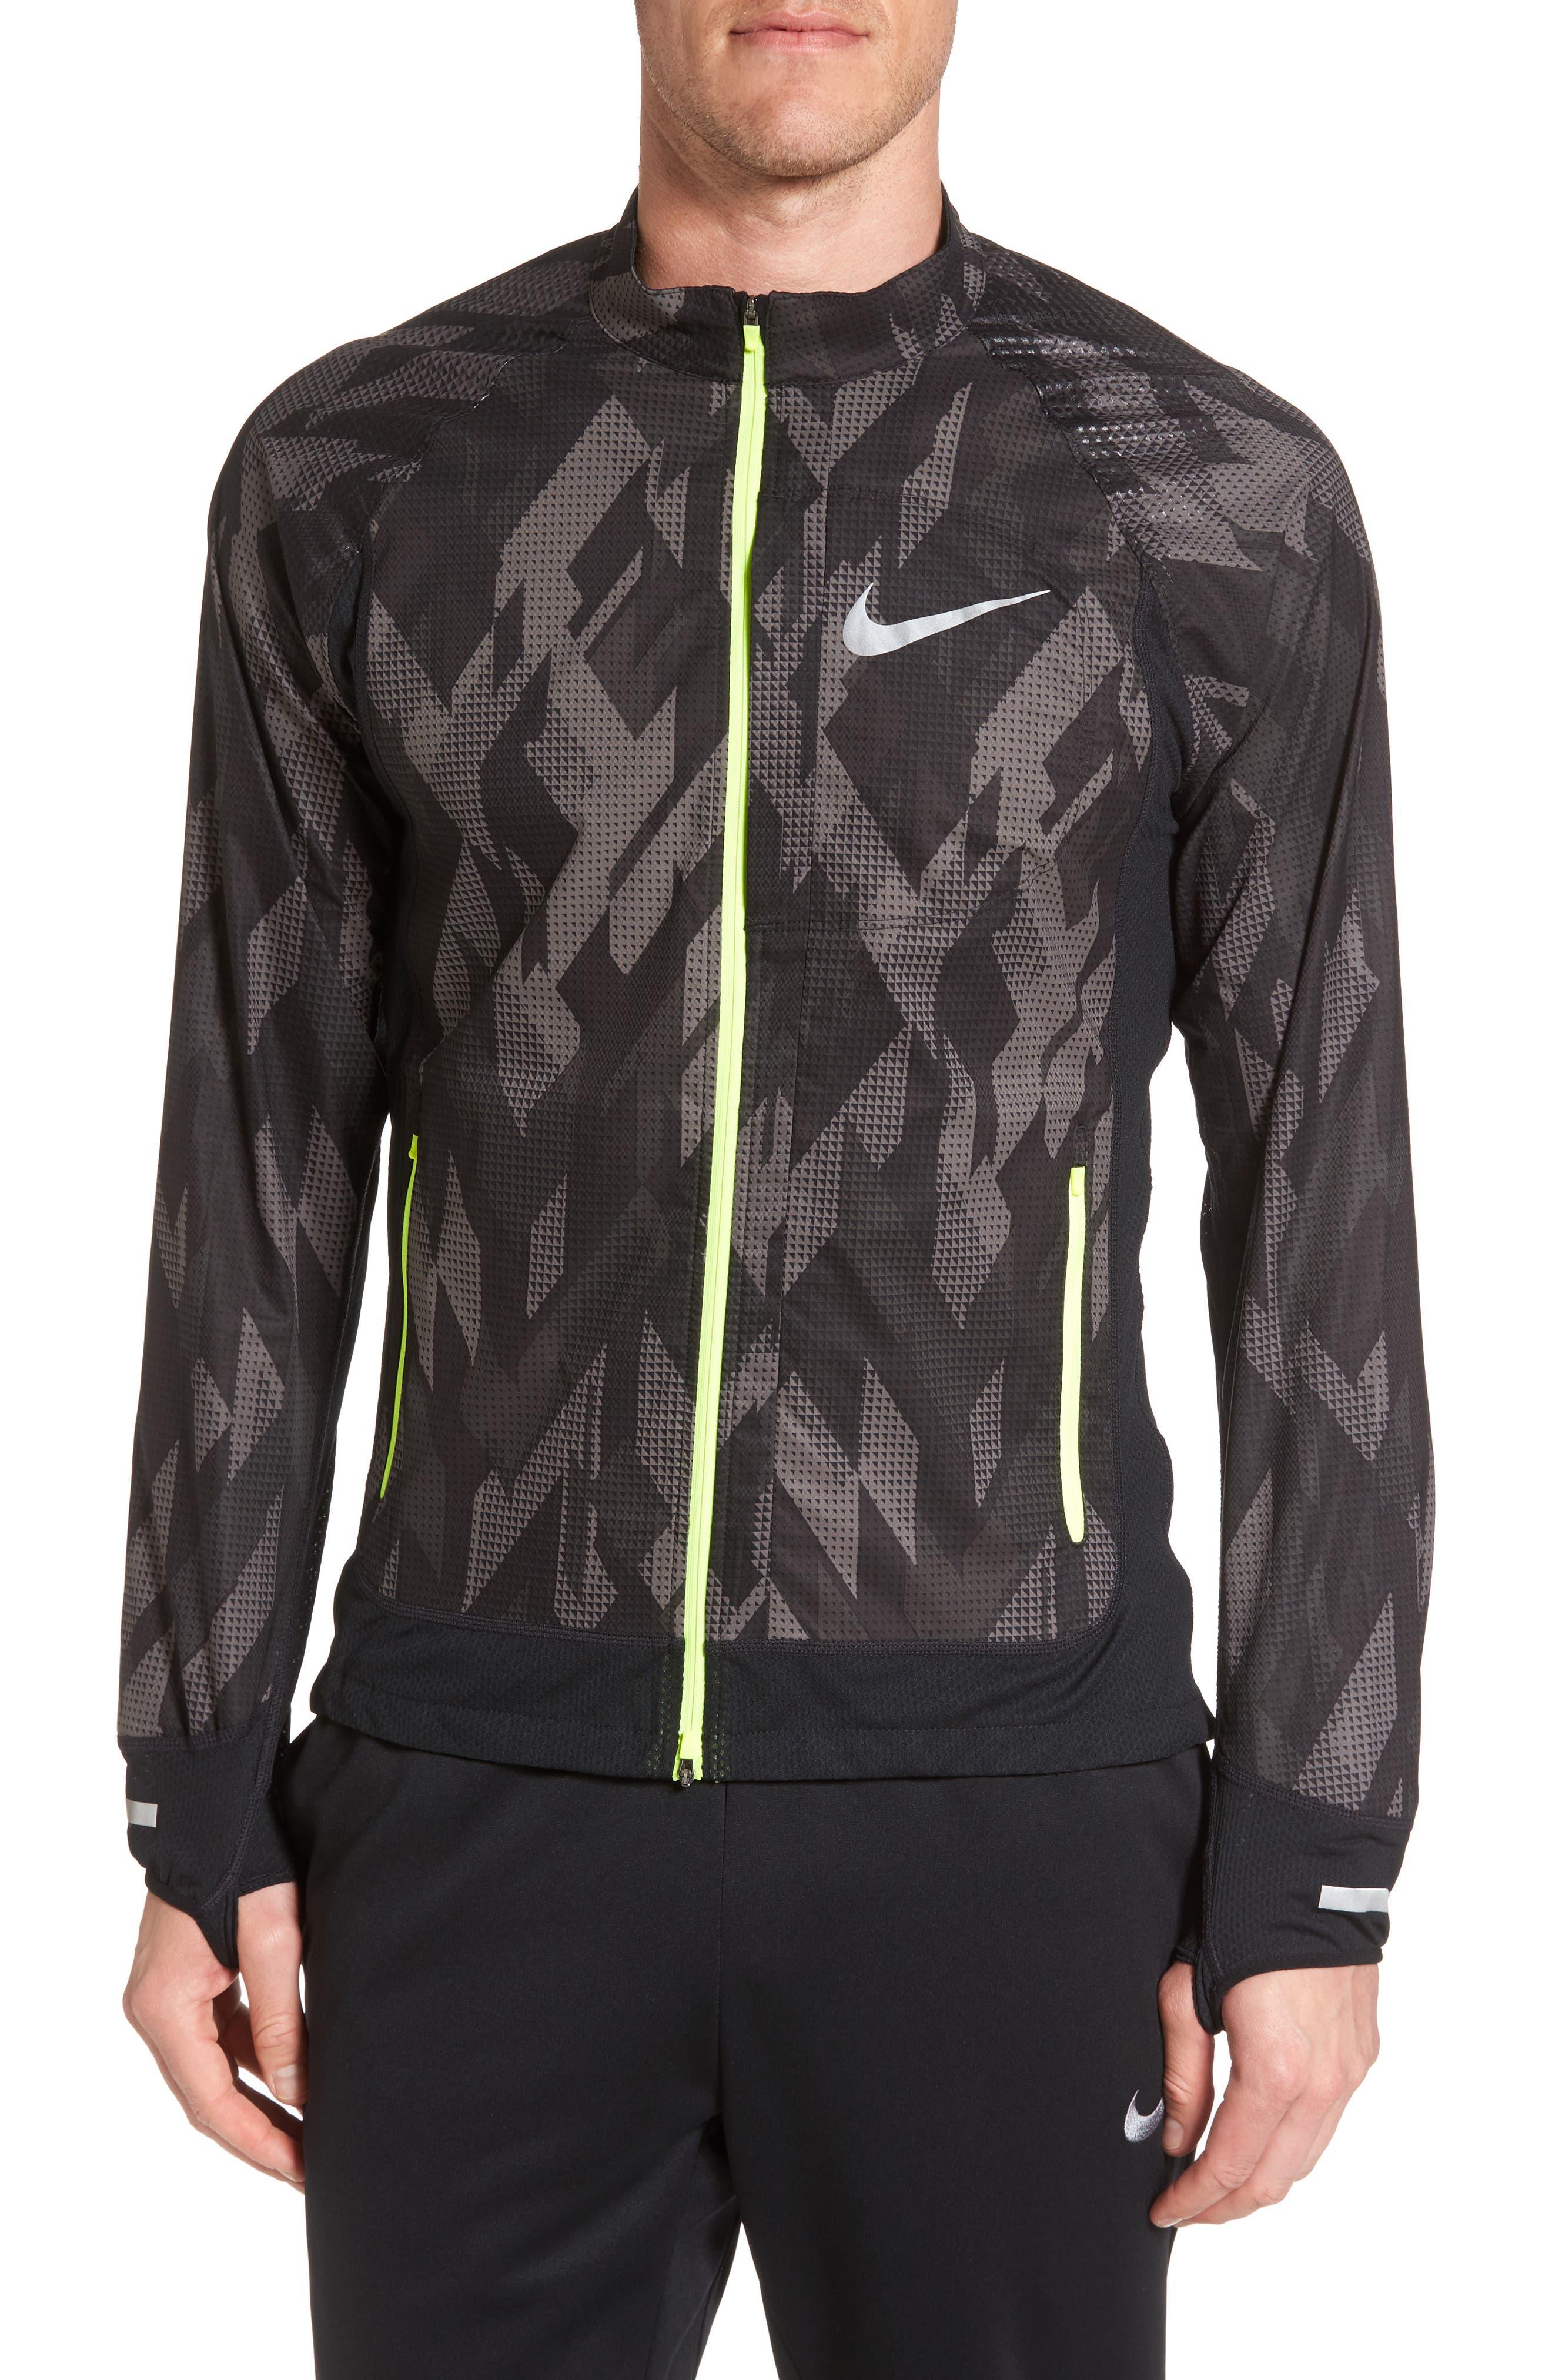 Nike Flex Running Jacket